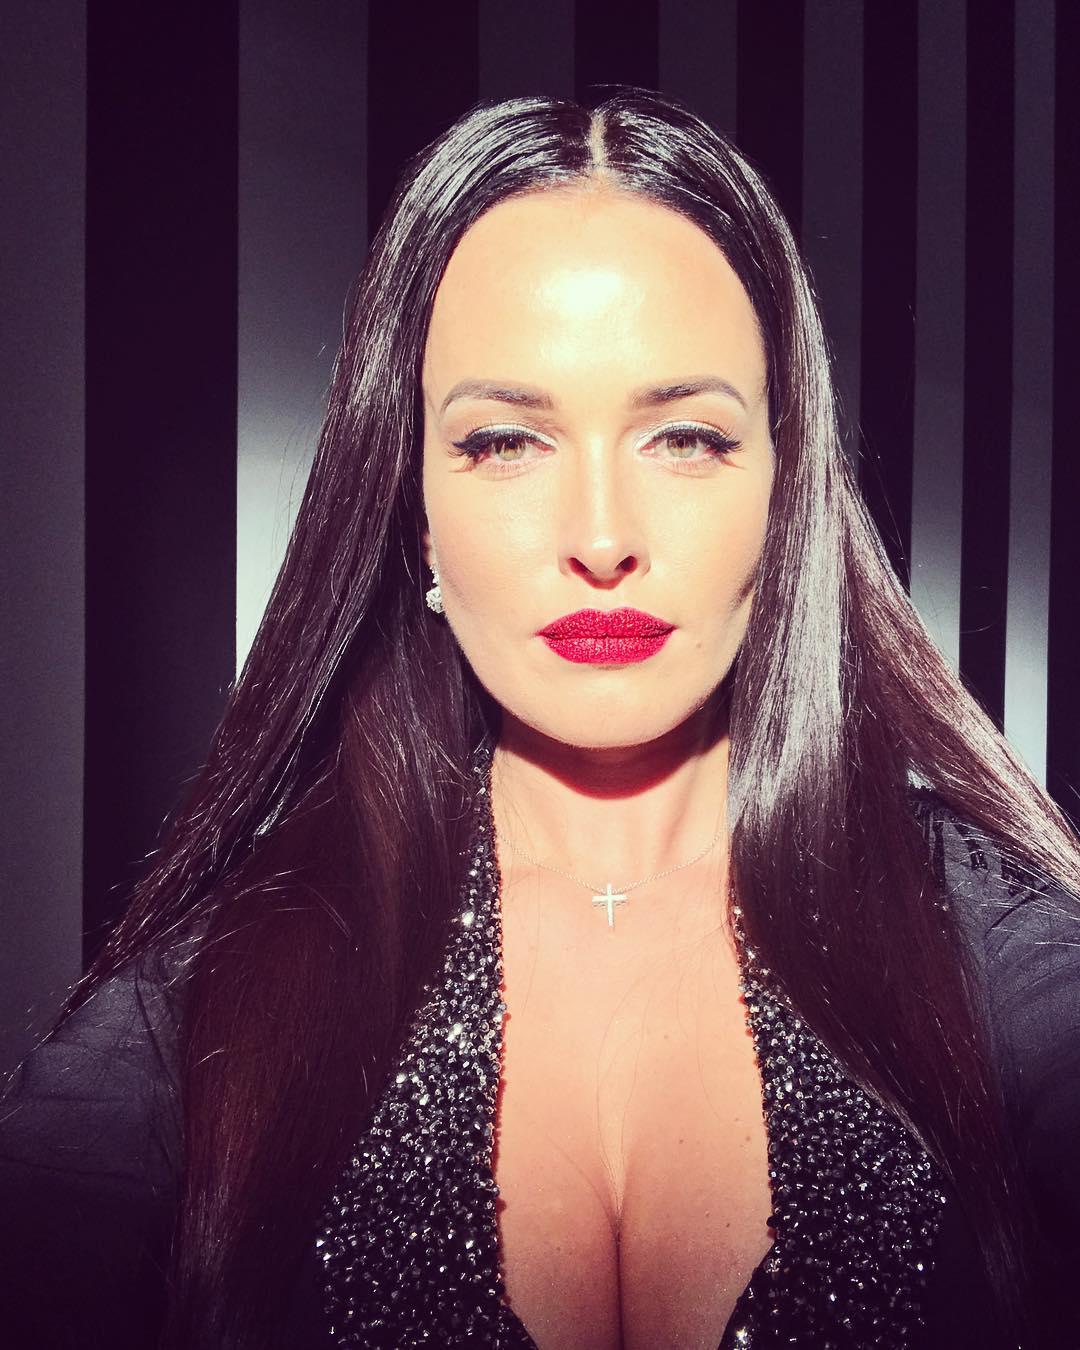 Даша Астафьева: New life... new me by :#idea @anna_gurban #outfit @artemklimchuk_official  @akpersonelle #hair @_hairs_diamond_  @serg.vorontsov #mua @love_sobko